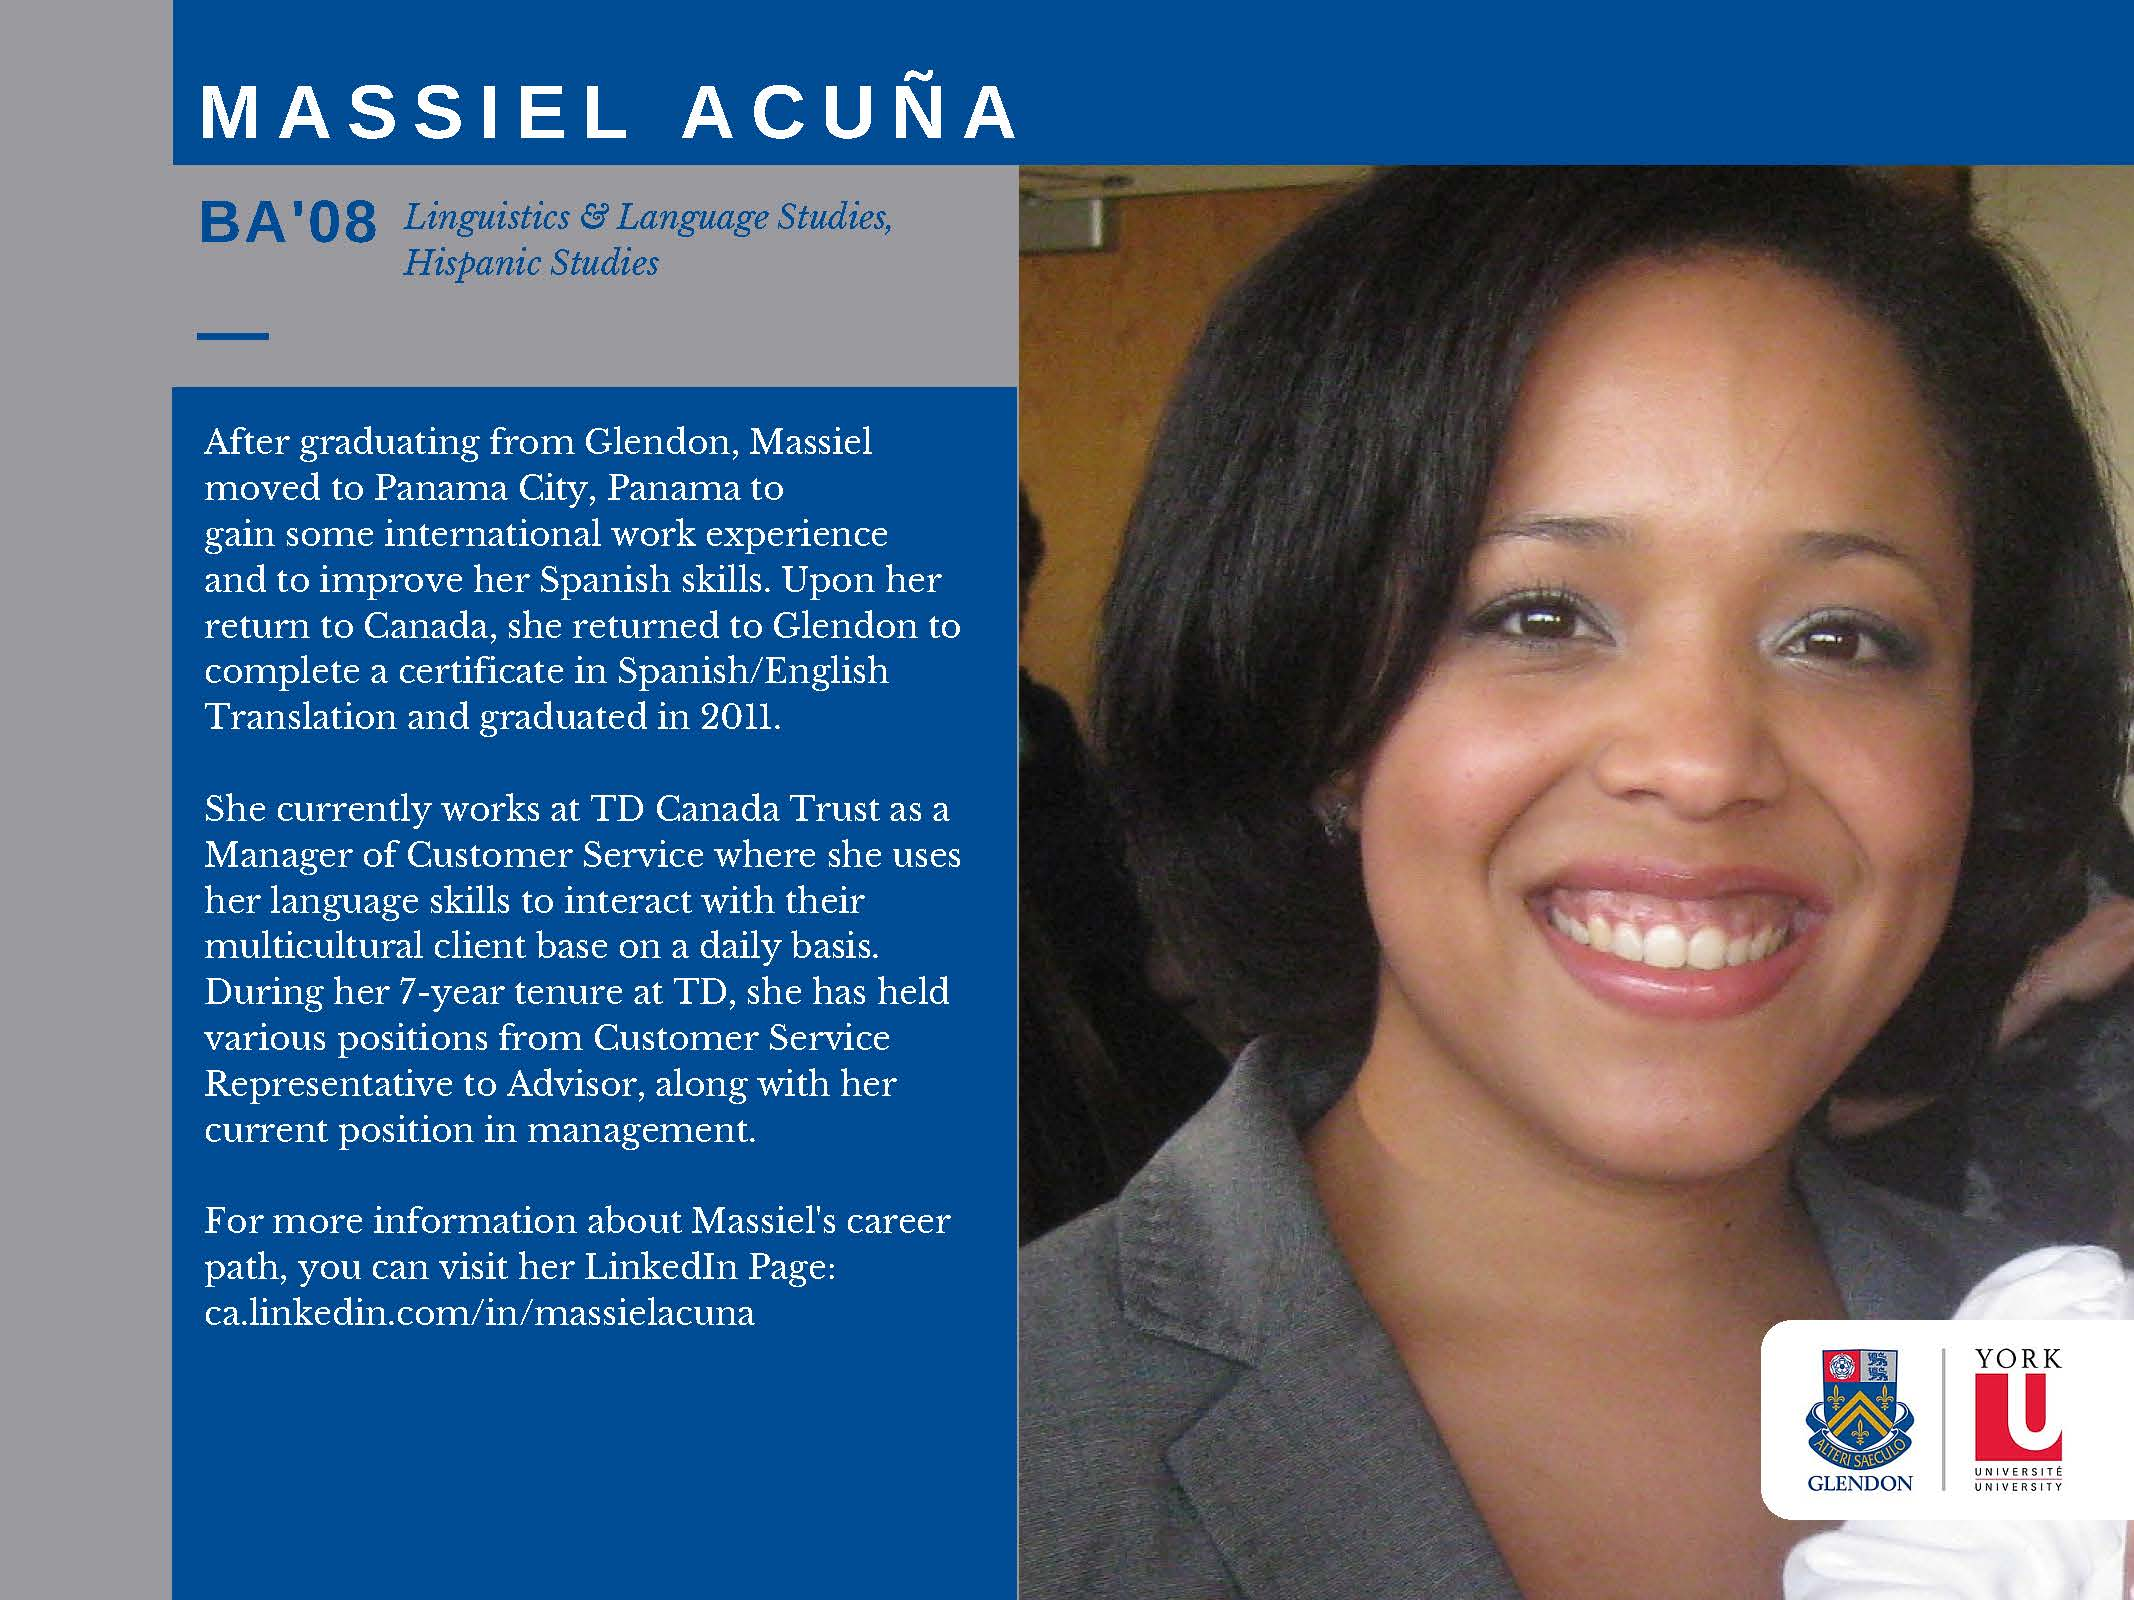 Massiel Acuna